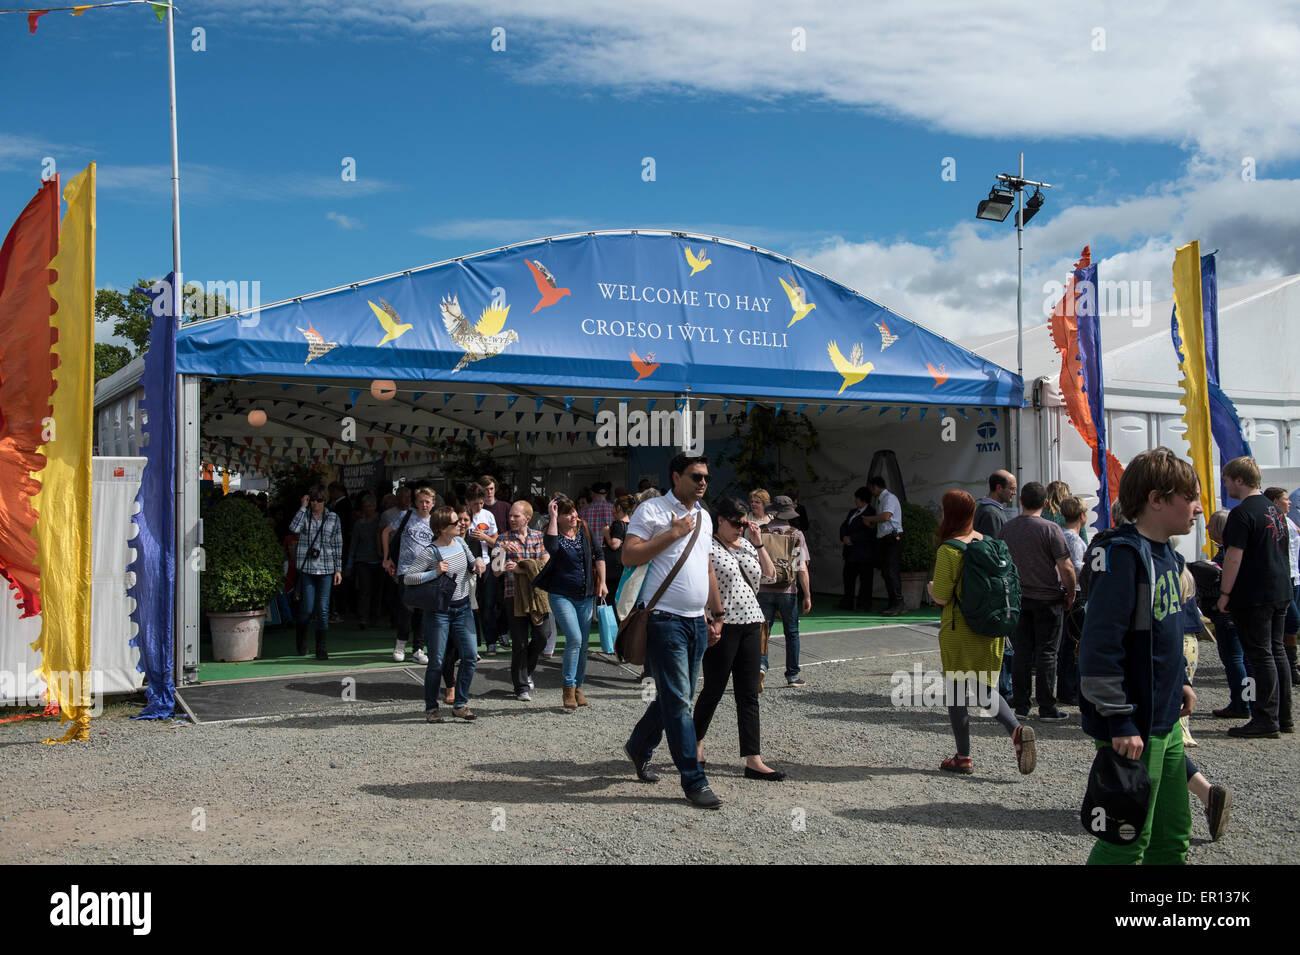 Hay-on-Wye, Wales, UK. 24th May, 2015. The main entrance to the Hay Festival on May 24, 2015 in Hay-on-Wye, Wales. - Stock Image